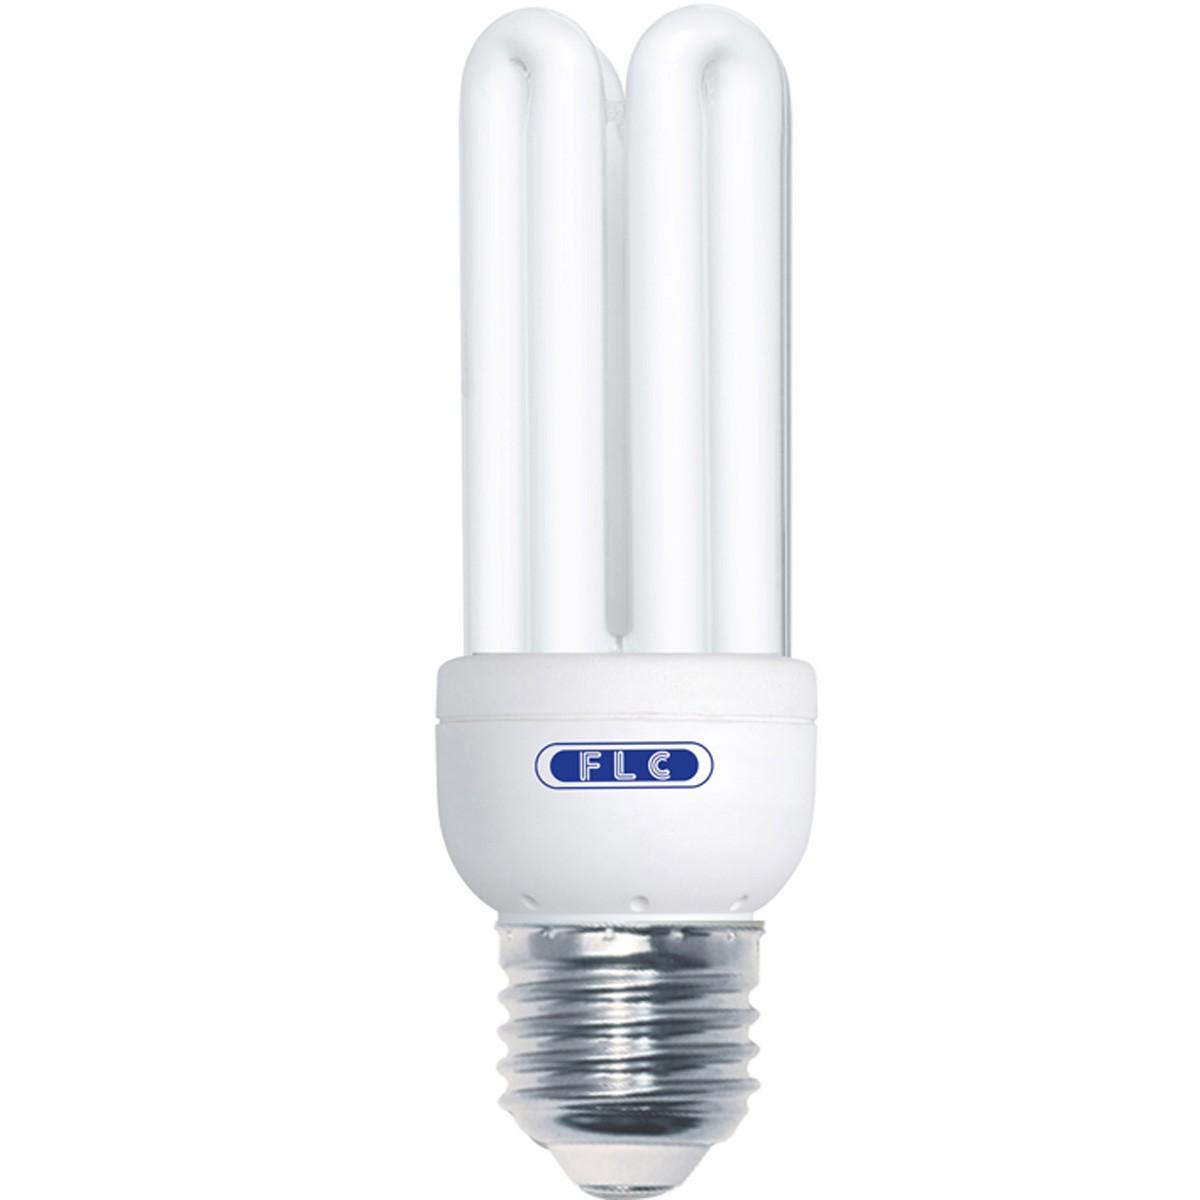 Lâmpada Fluor Compacta Eletrônica  23W 220V Branca